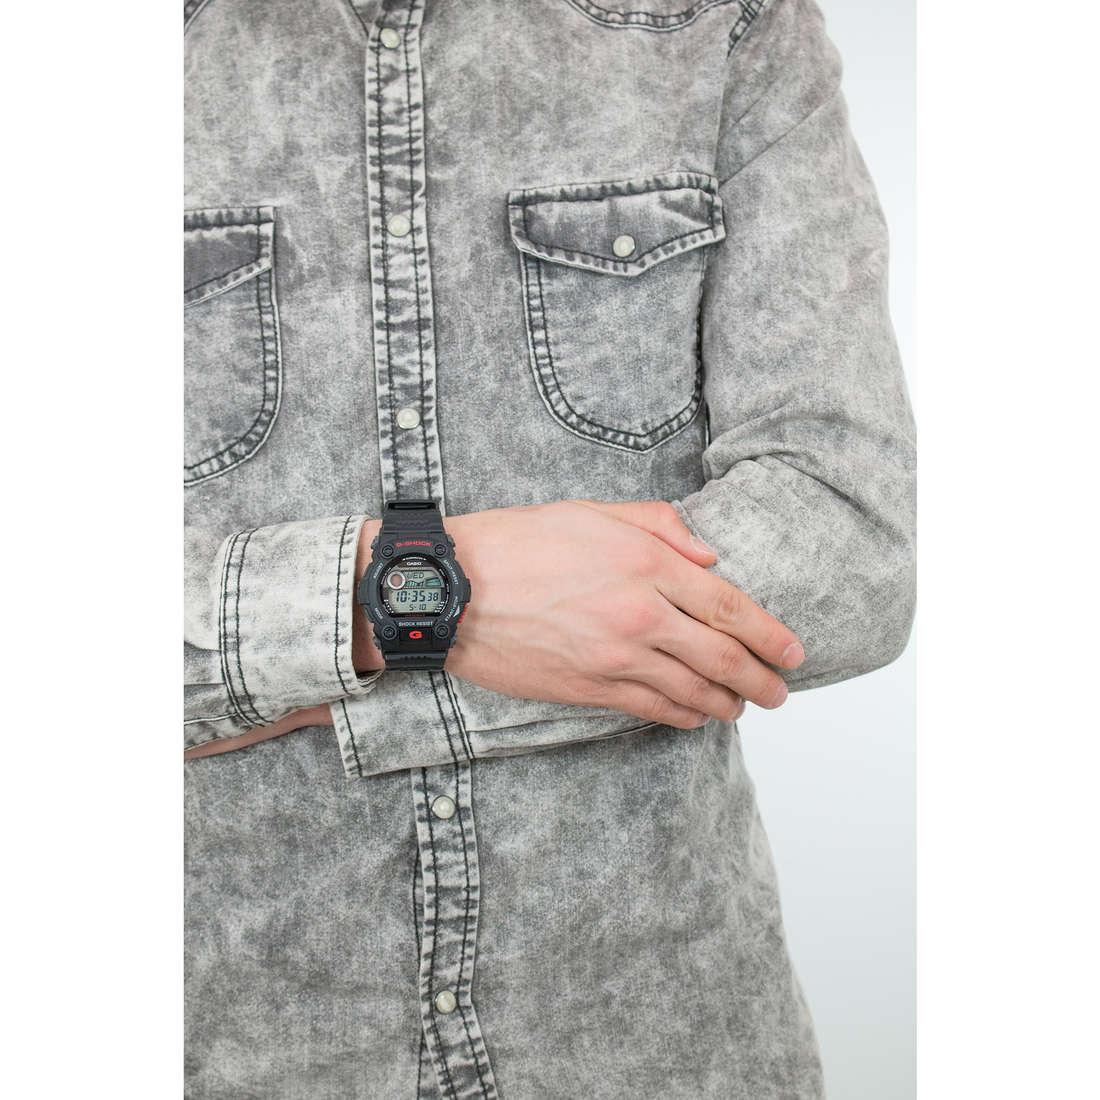 Casio digitali G-Shock uomo G-7900-1ER indosso